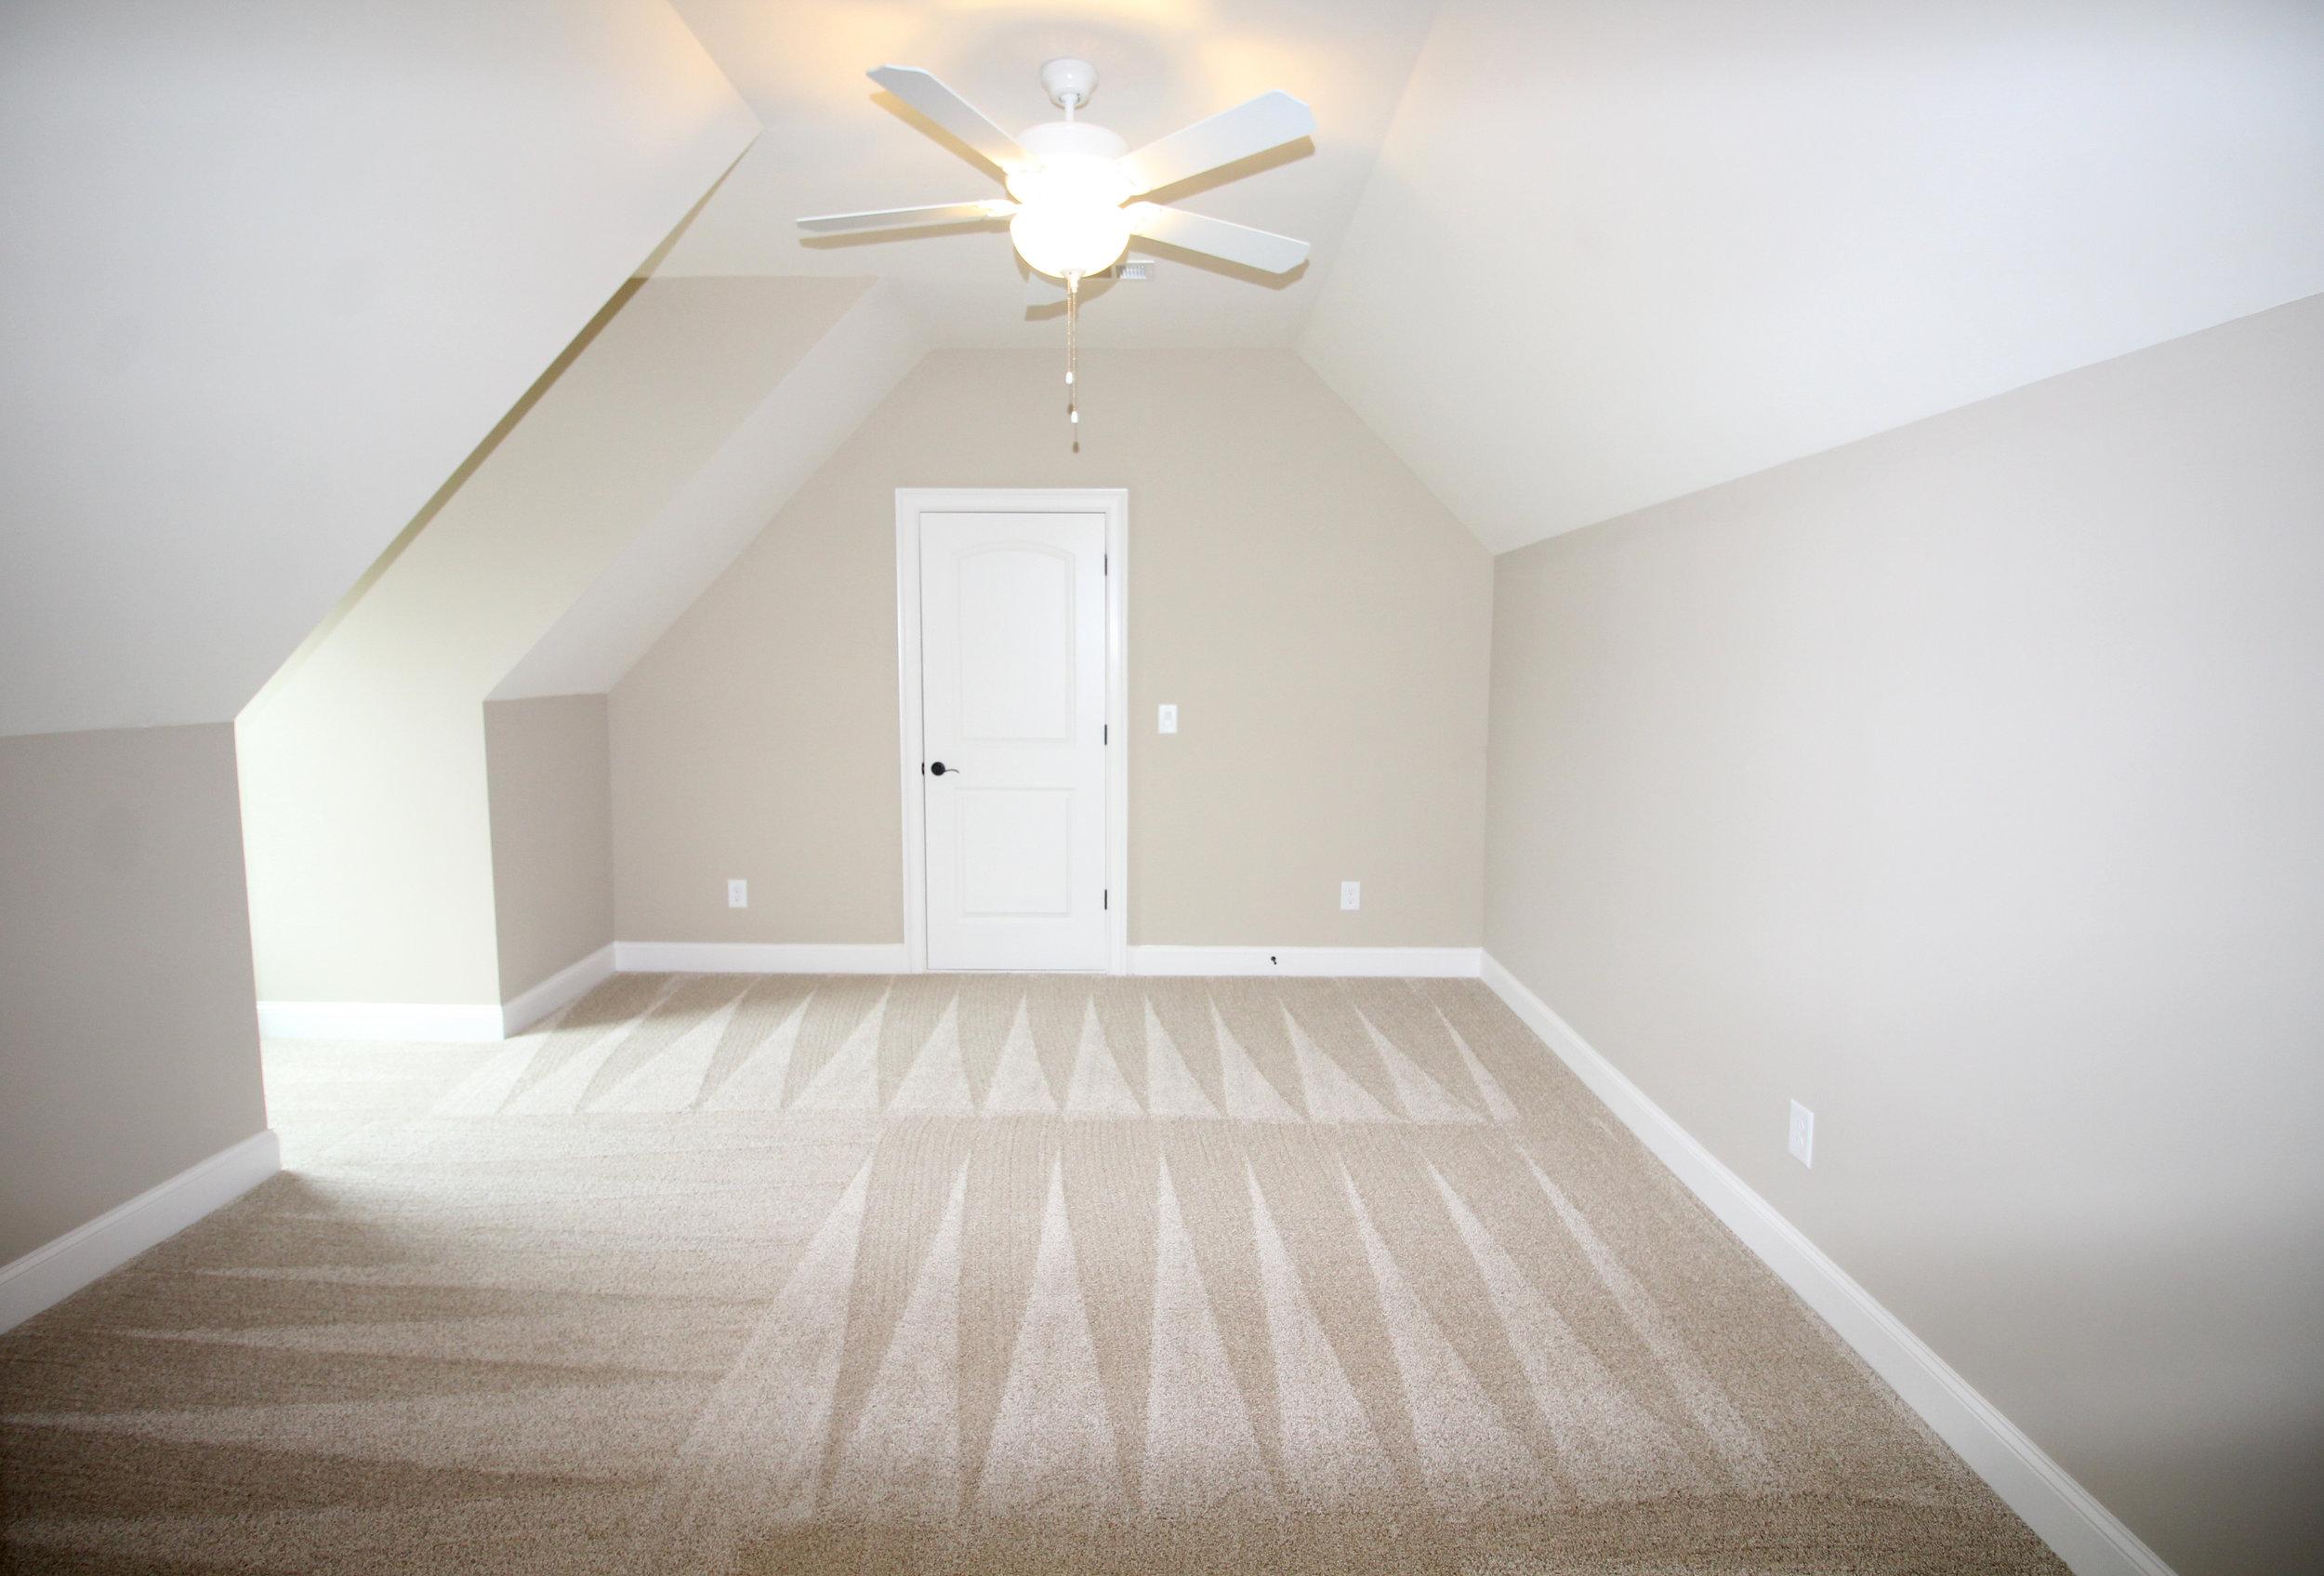 bright-open-bonus-room-1756-greenleffe-drive-statham-ga-30666-the-georgia-club-oconee-county-oconee-springs-athens-area-home-for-sale-courtyard-homes.JPG